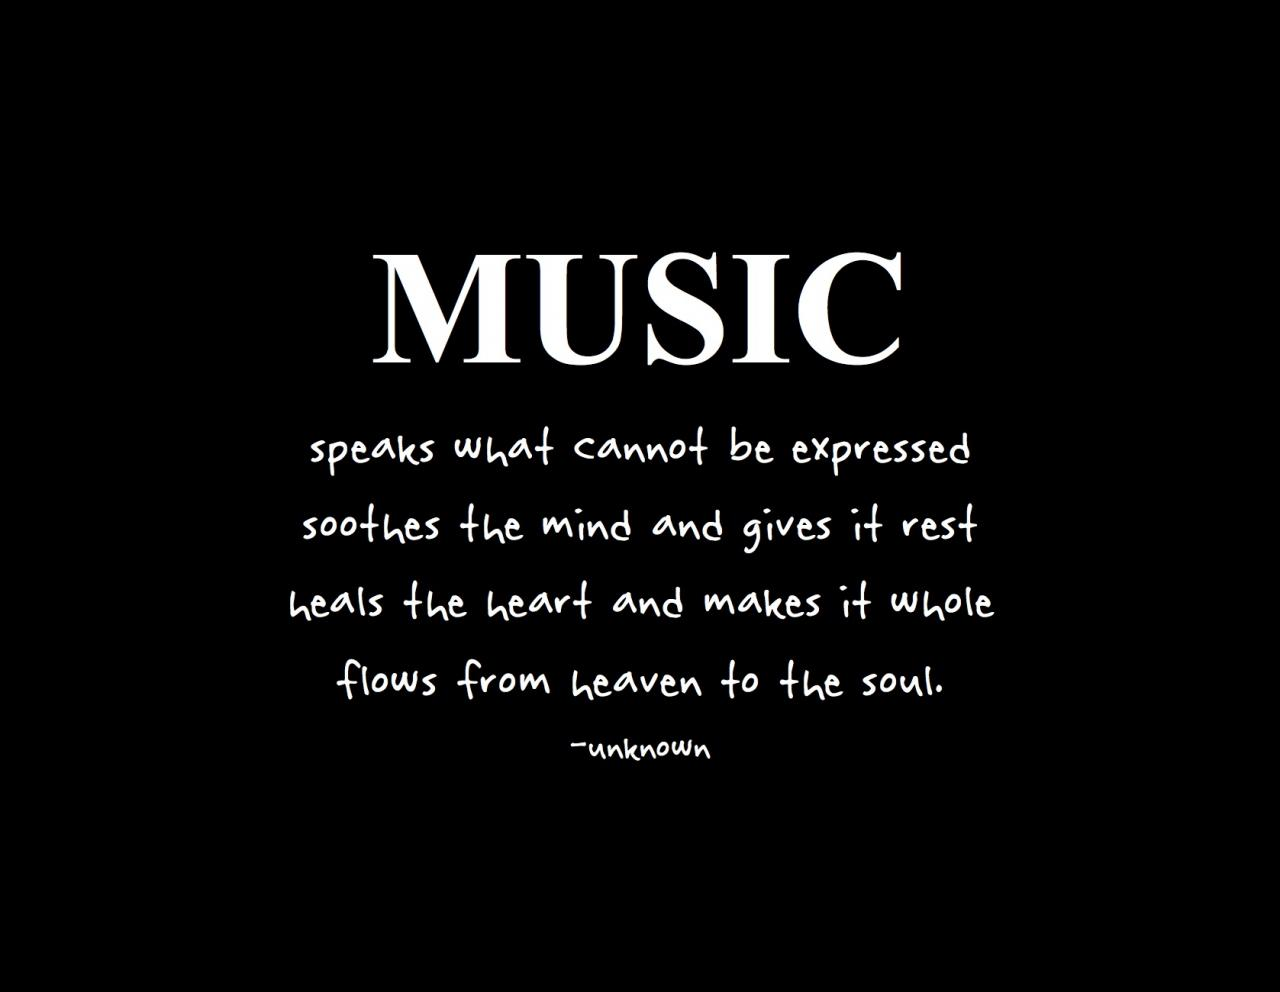 Love Music Quotes Soundtrack Of Your Soul Big Picturefine Focus